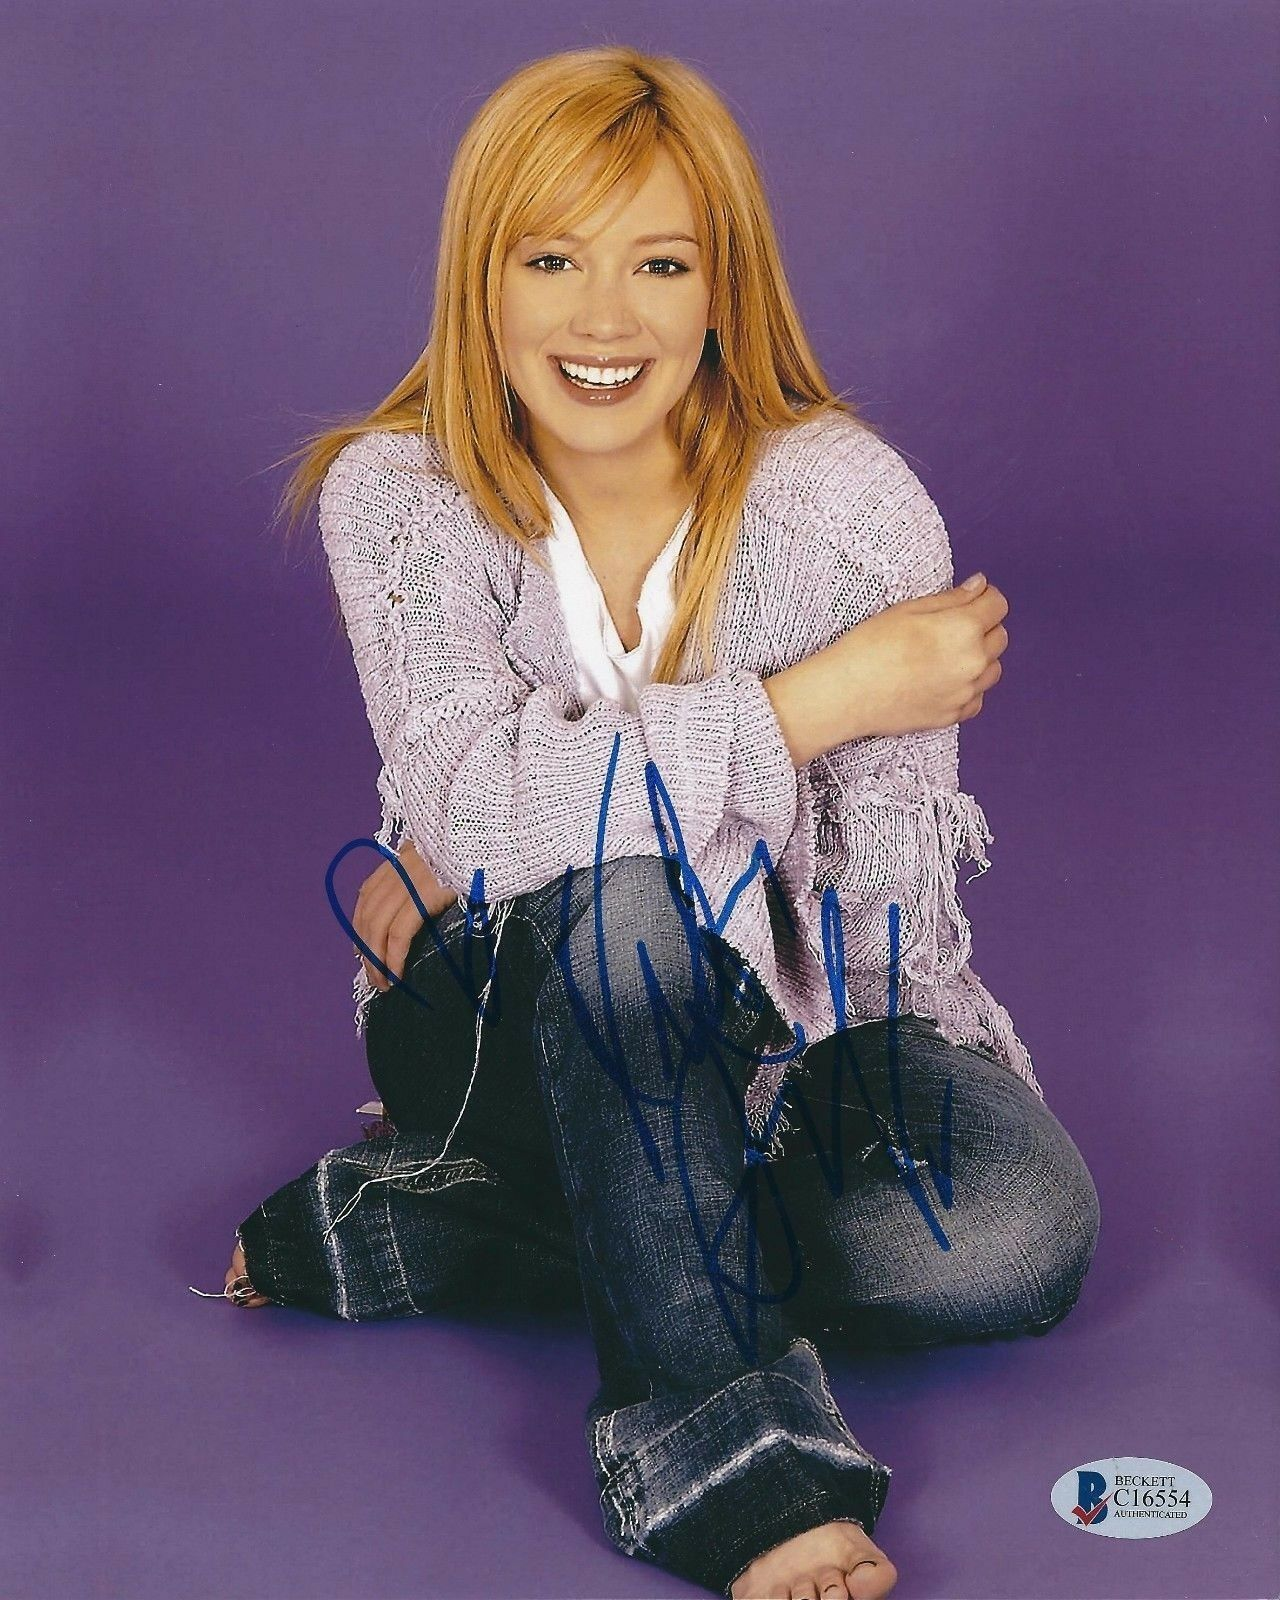 Hillary Duff Signed 8x10 Photo Beckett *Disney *Model *Actress C16554